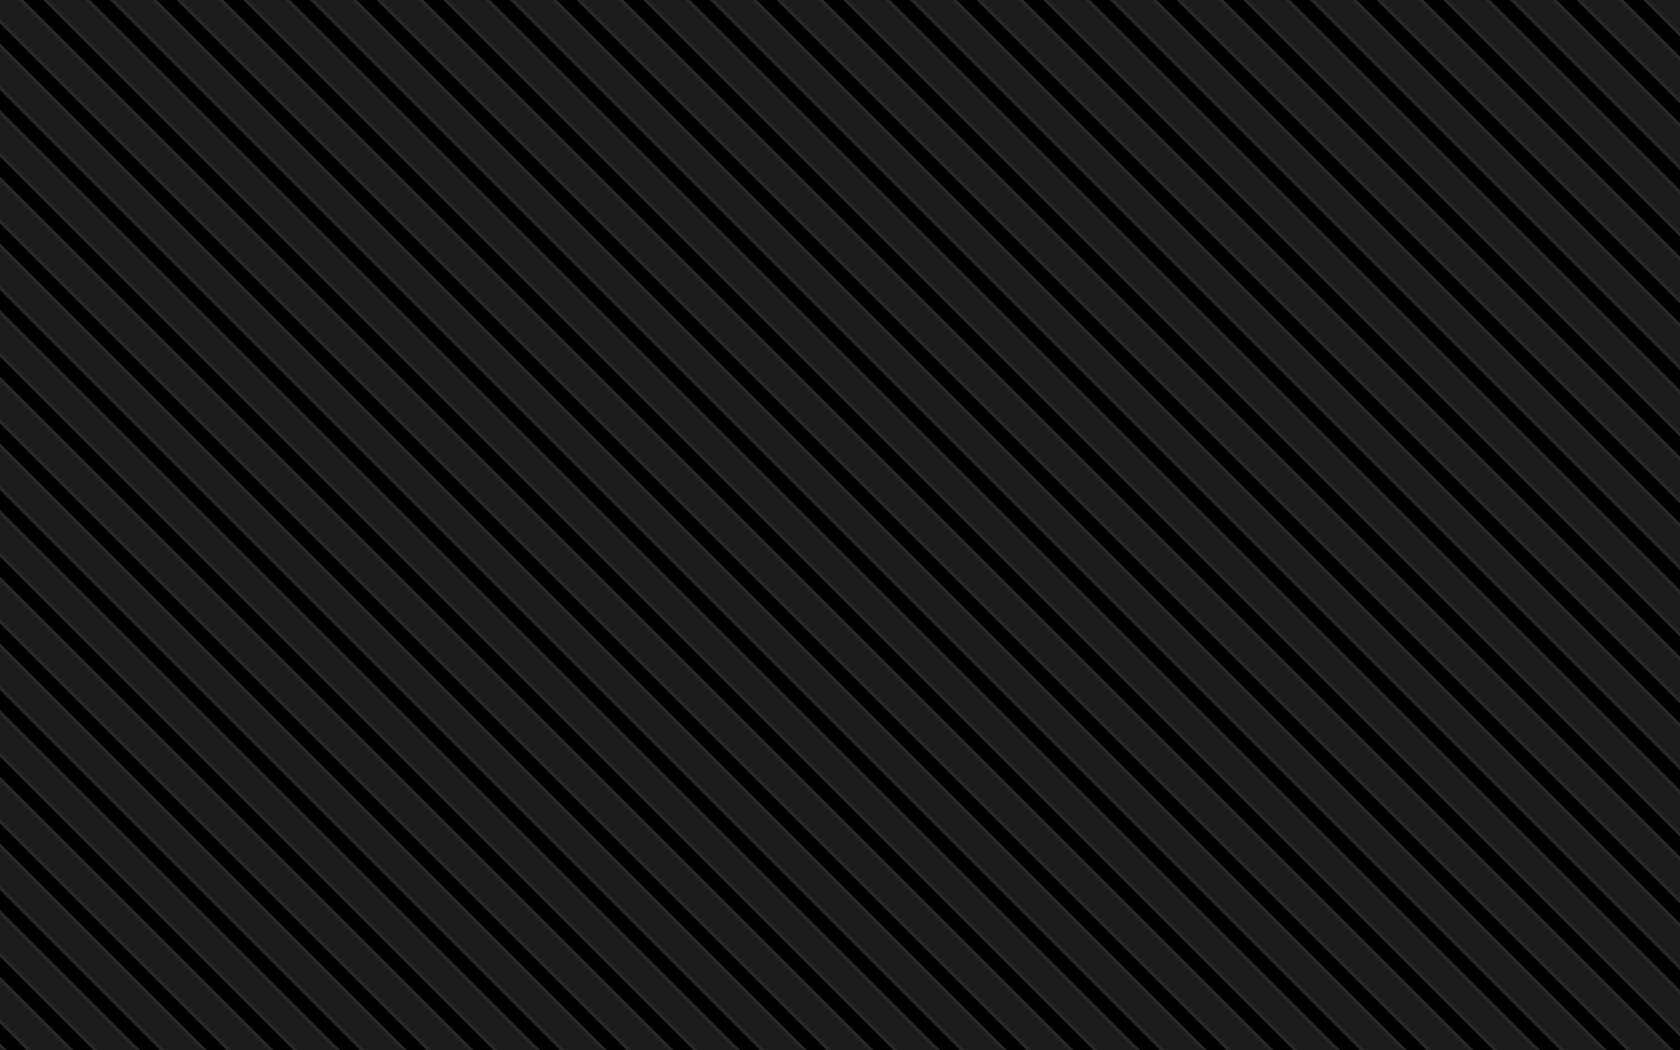 striped.